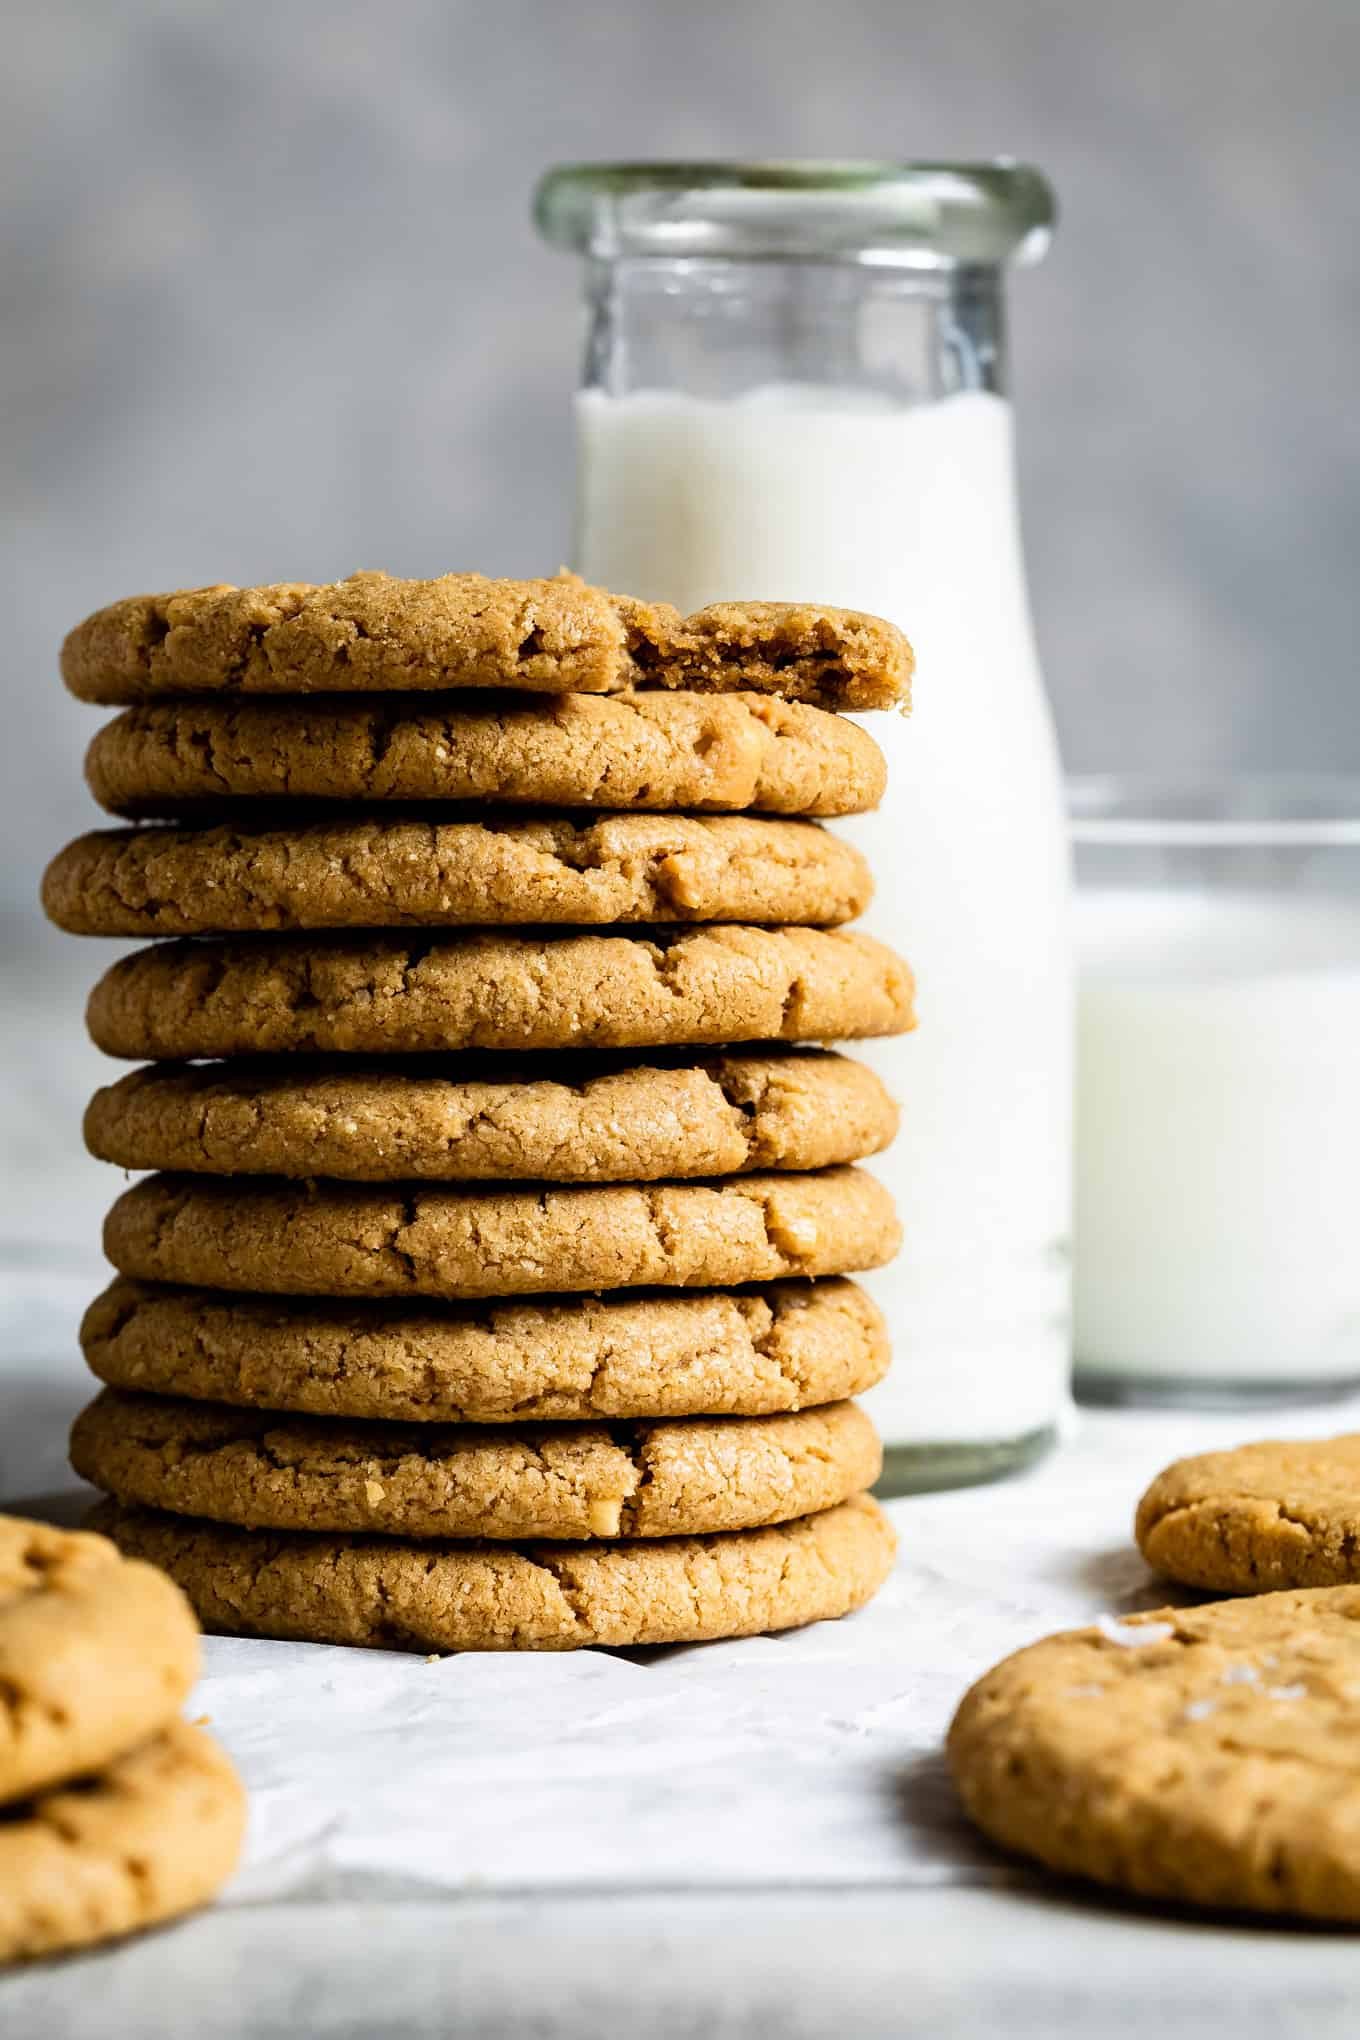 Gluten-Free Christmas Cookies: Peanut Butter